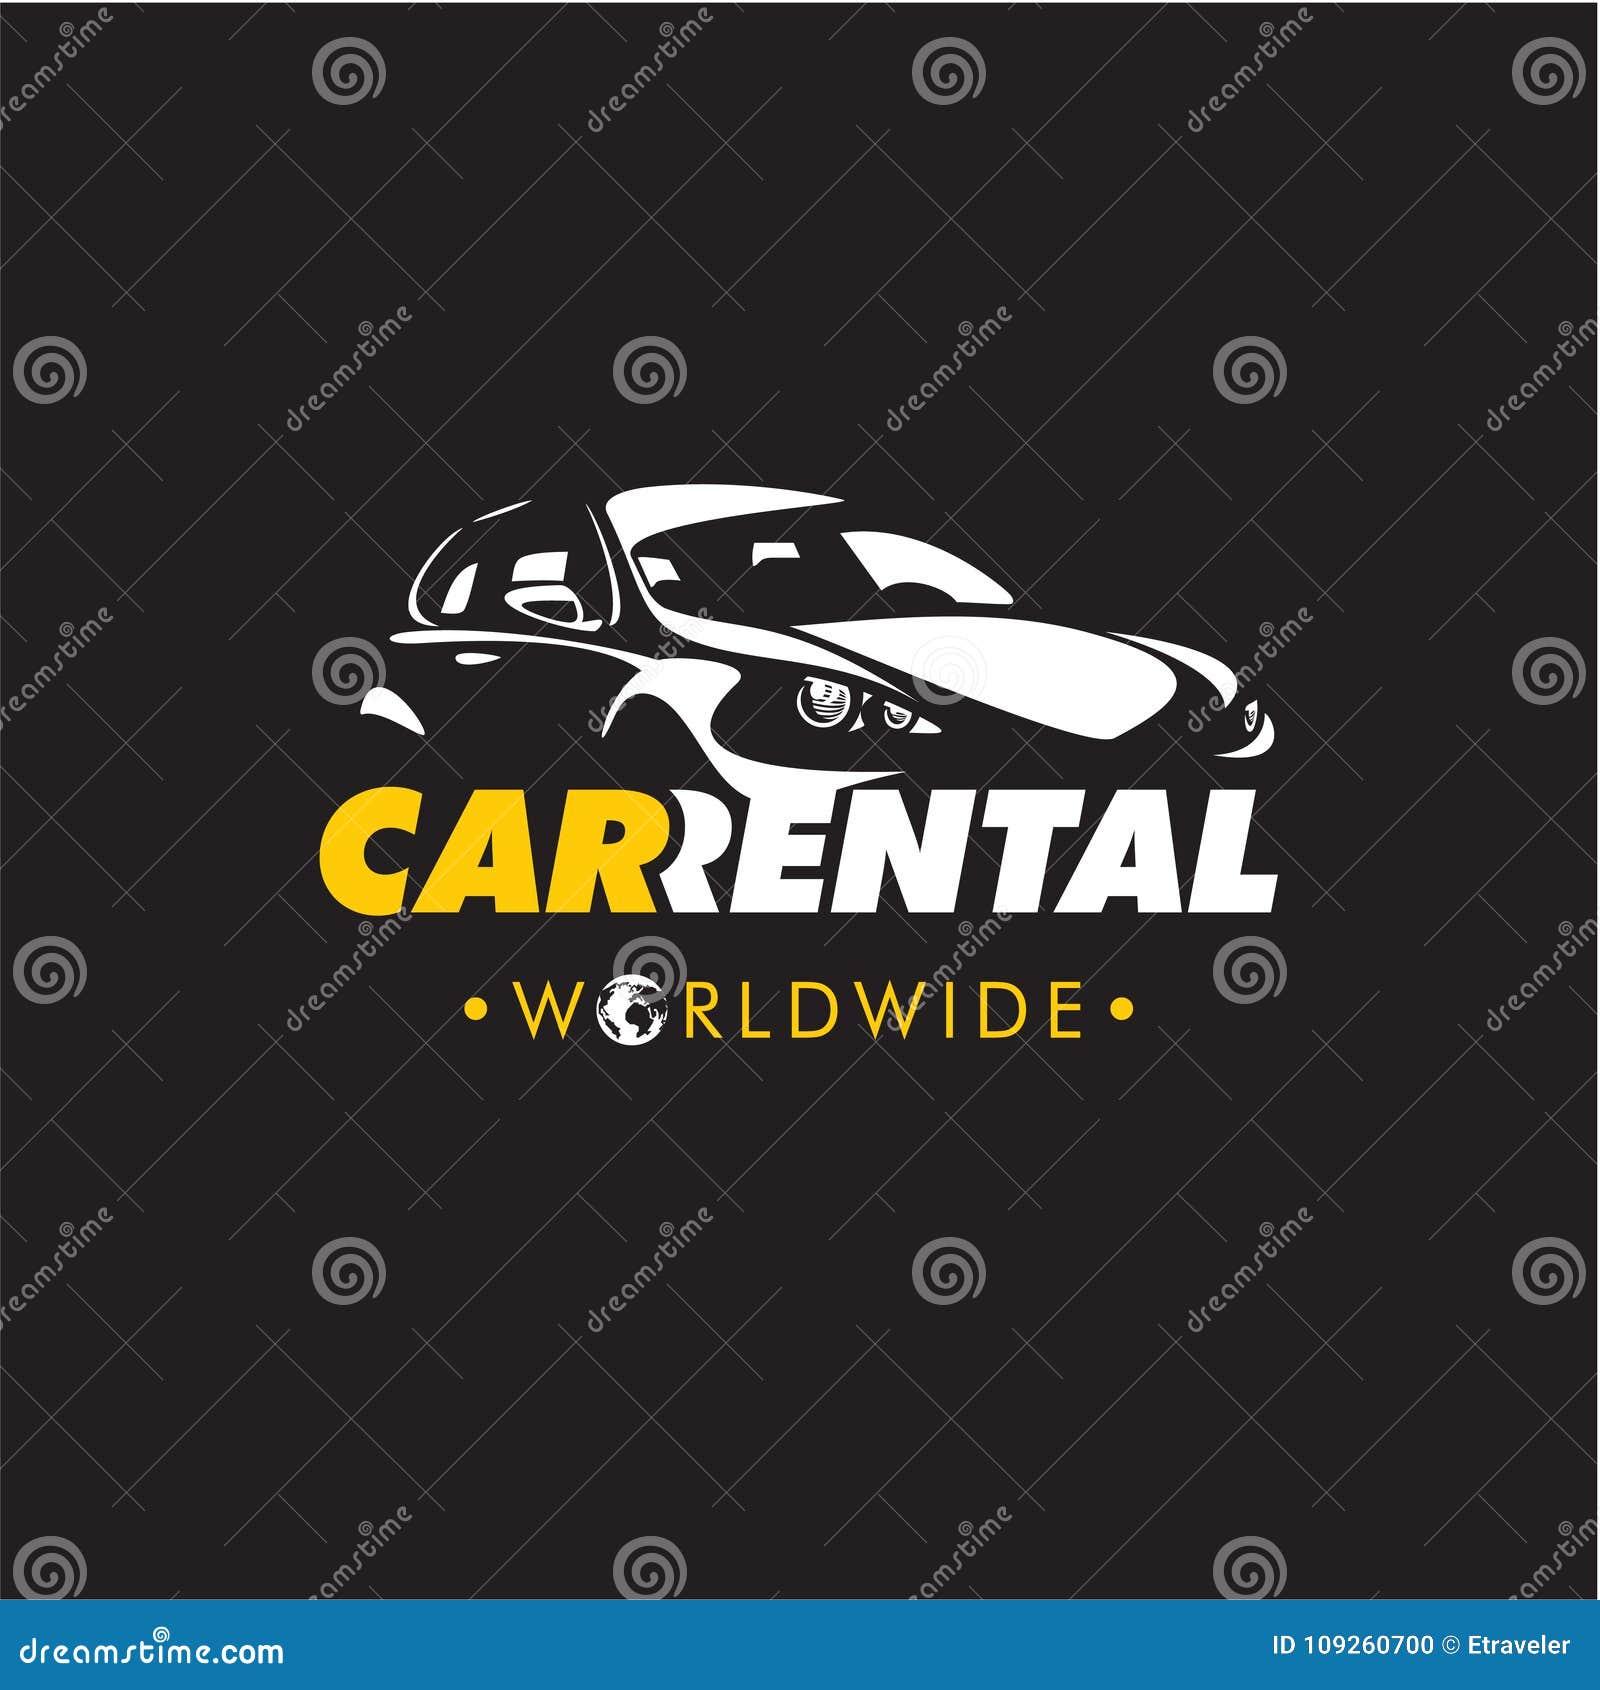 Car Rental Logo Rent A Car Stock Vector Illustration Of Sale Automotive 109260700